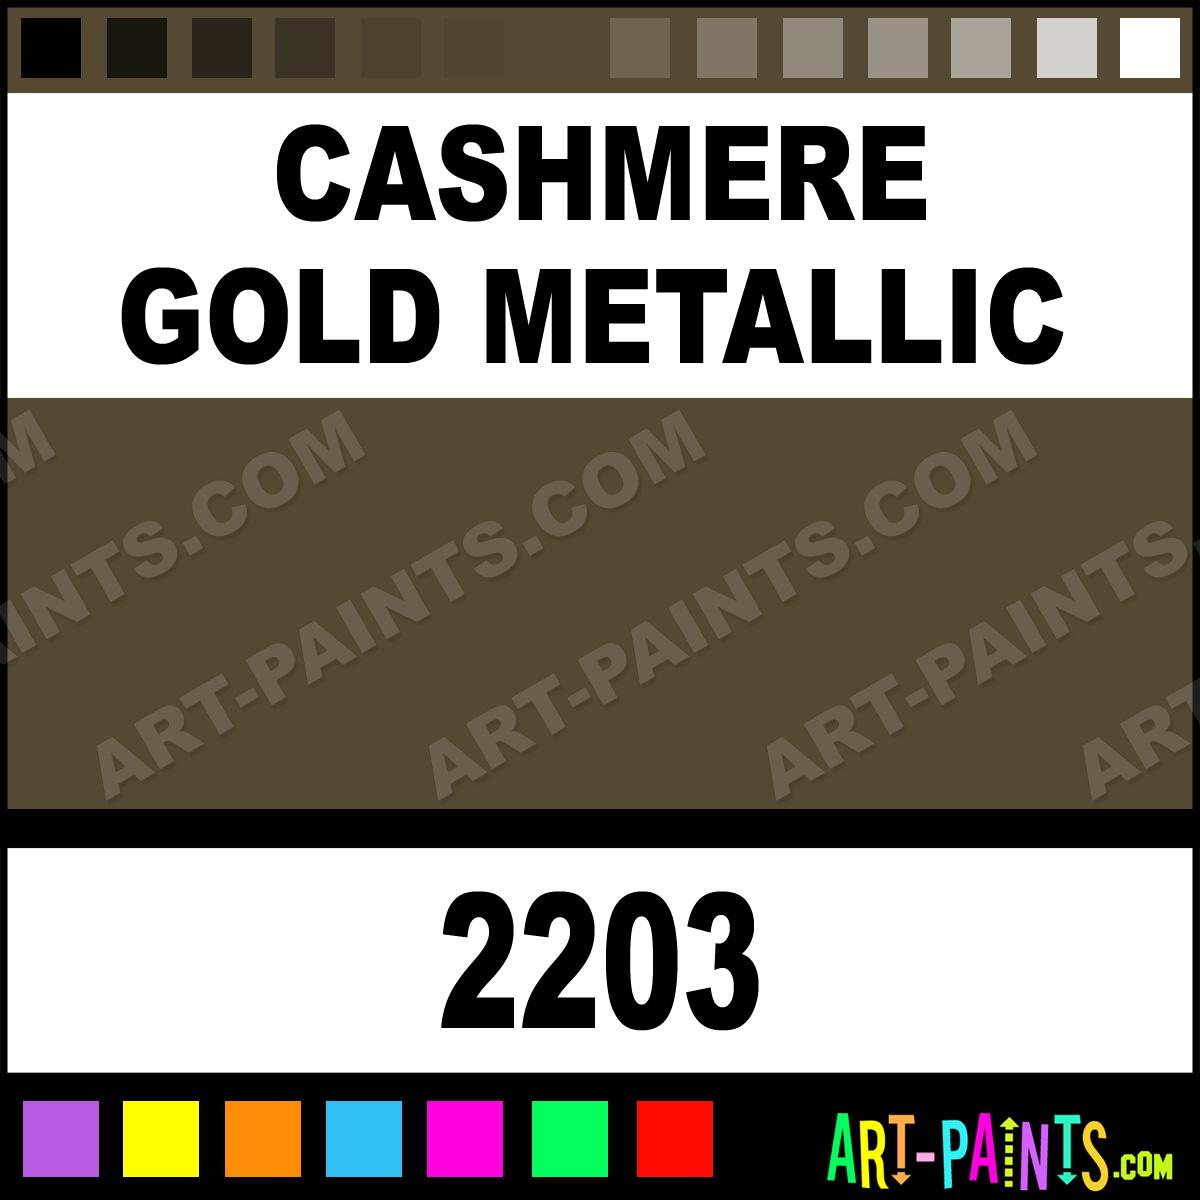 Cashmere Gold Metallic Acrylic Enamel Paints 2203